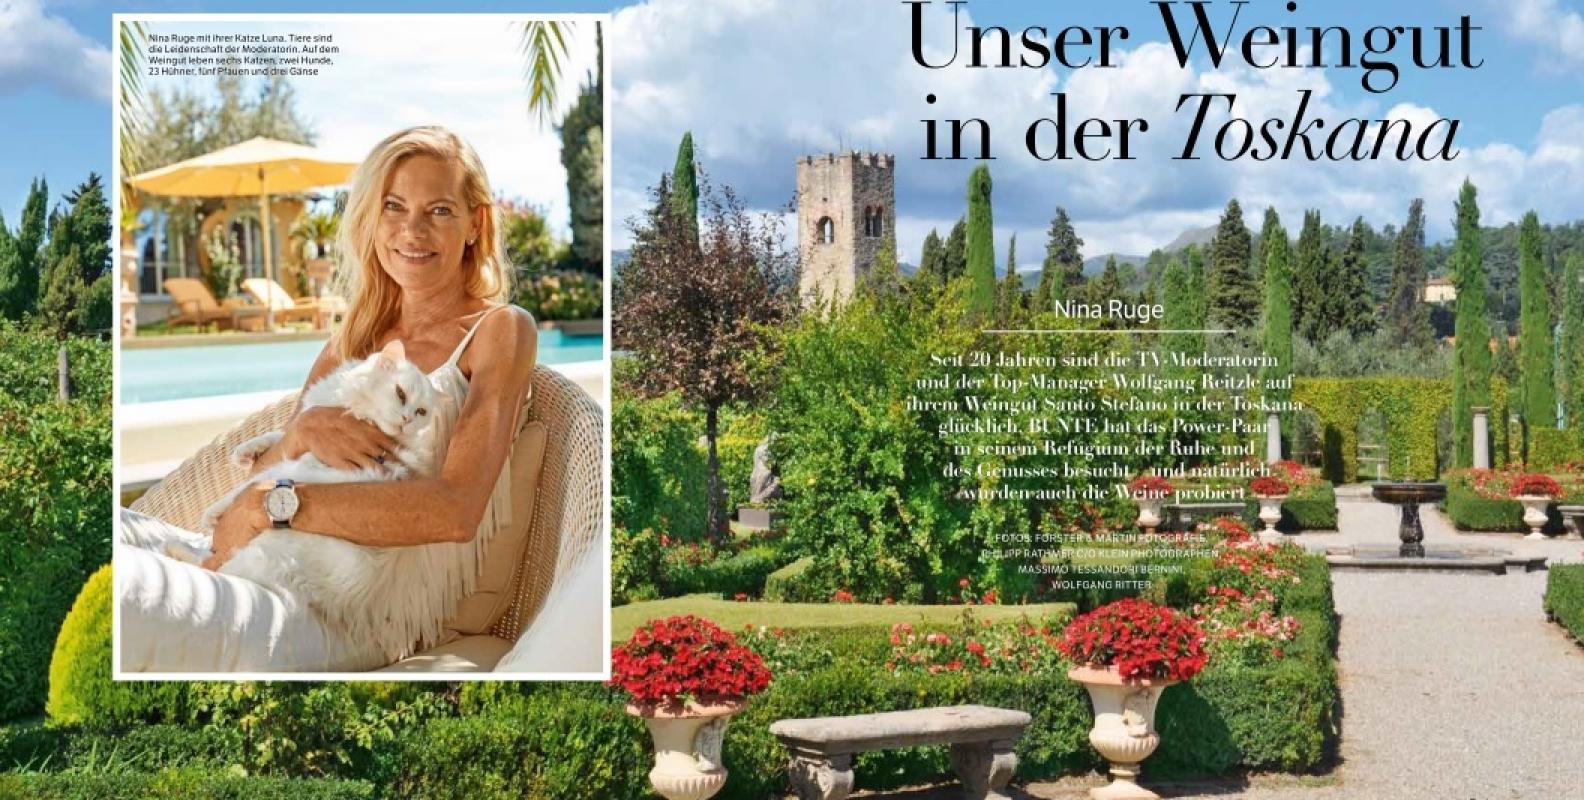 Besuch in der Toskana: Titelstory in BUNTE Genuss&Stil